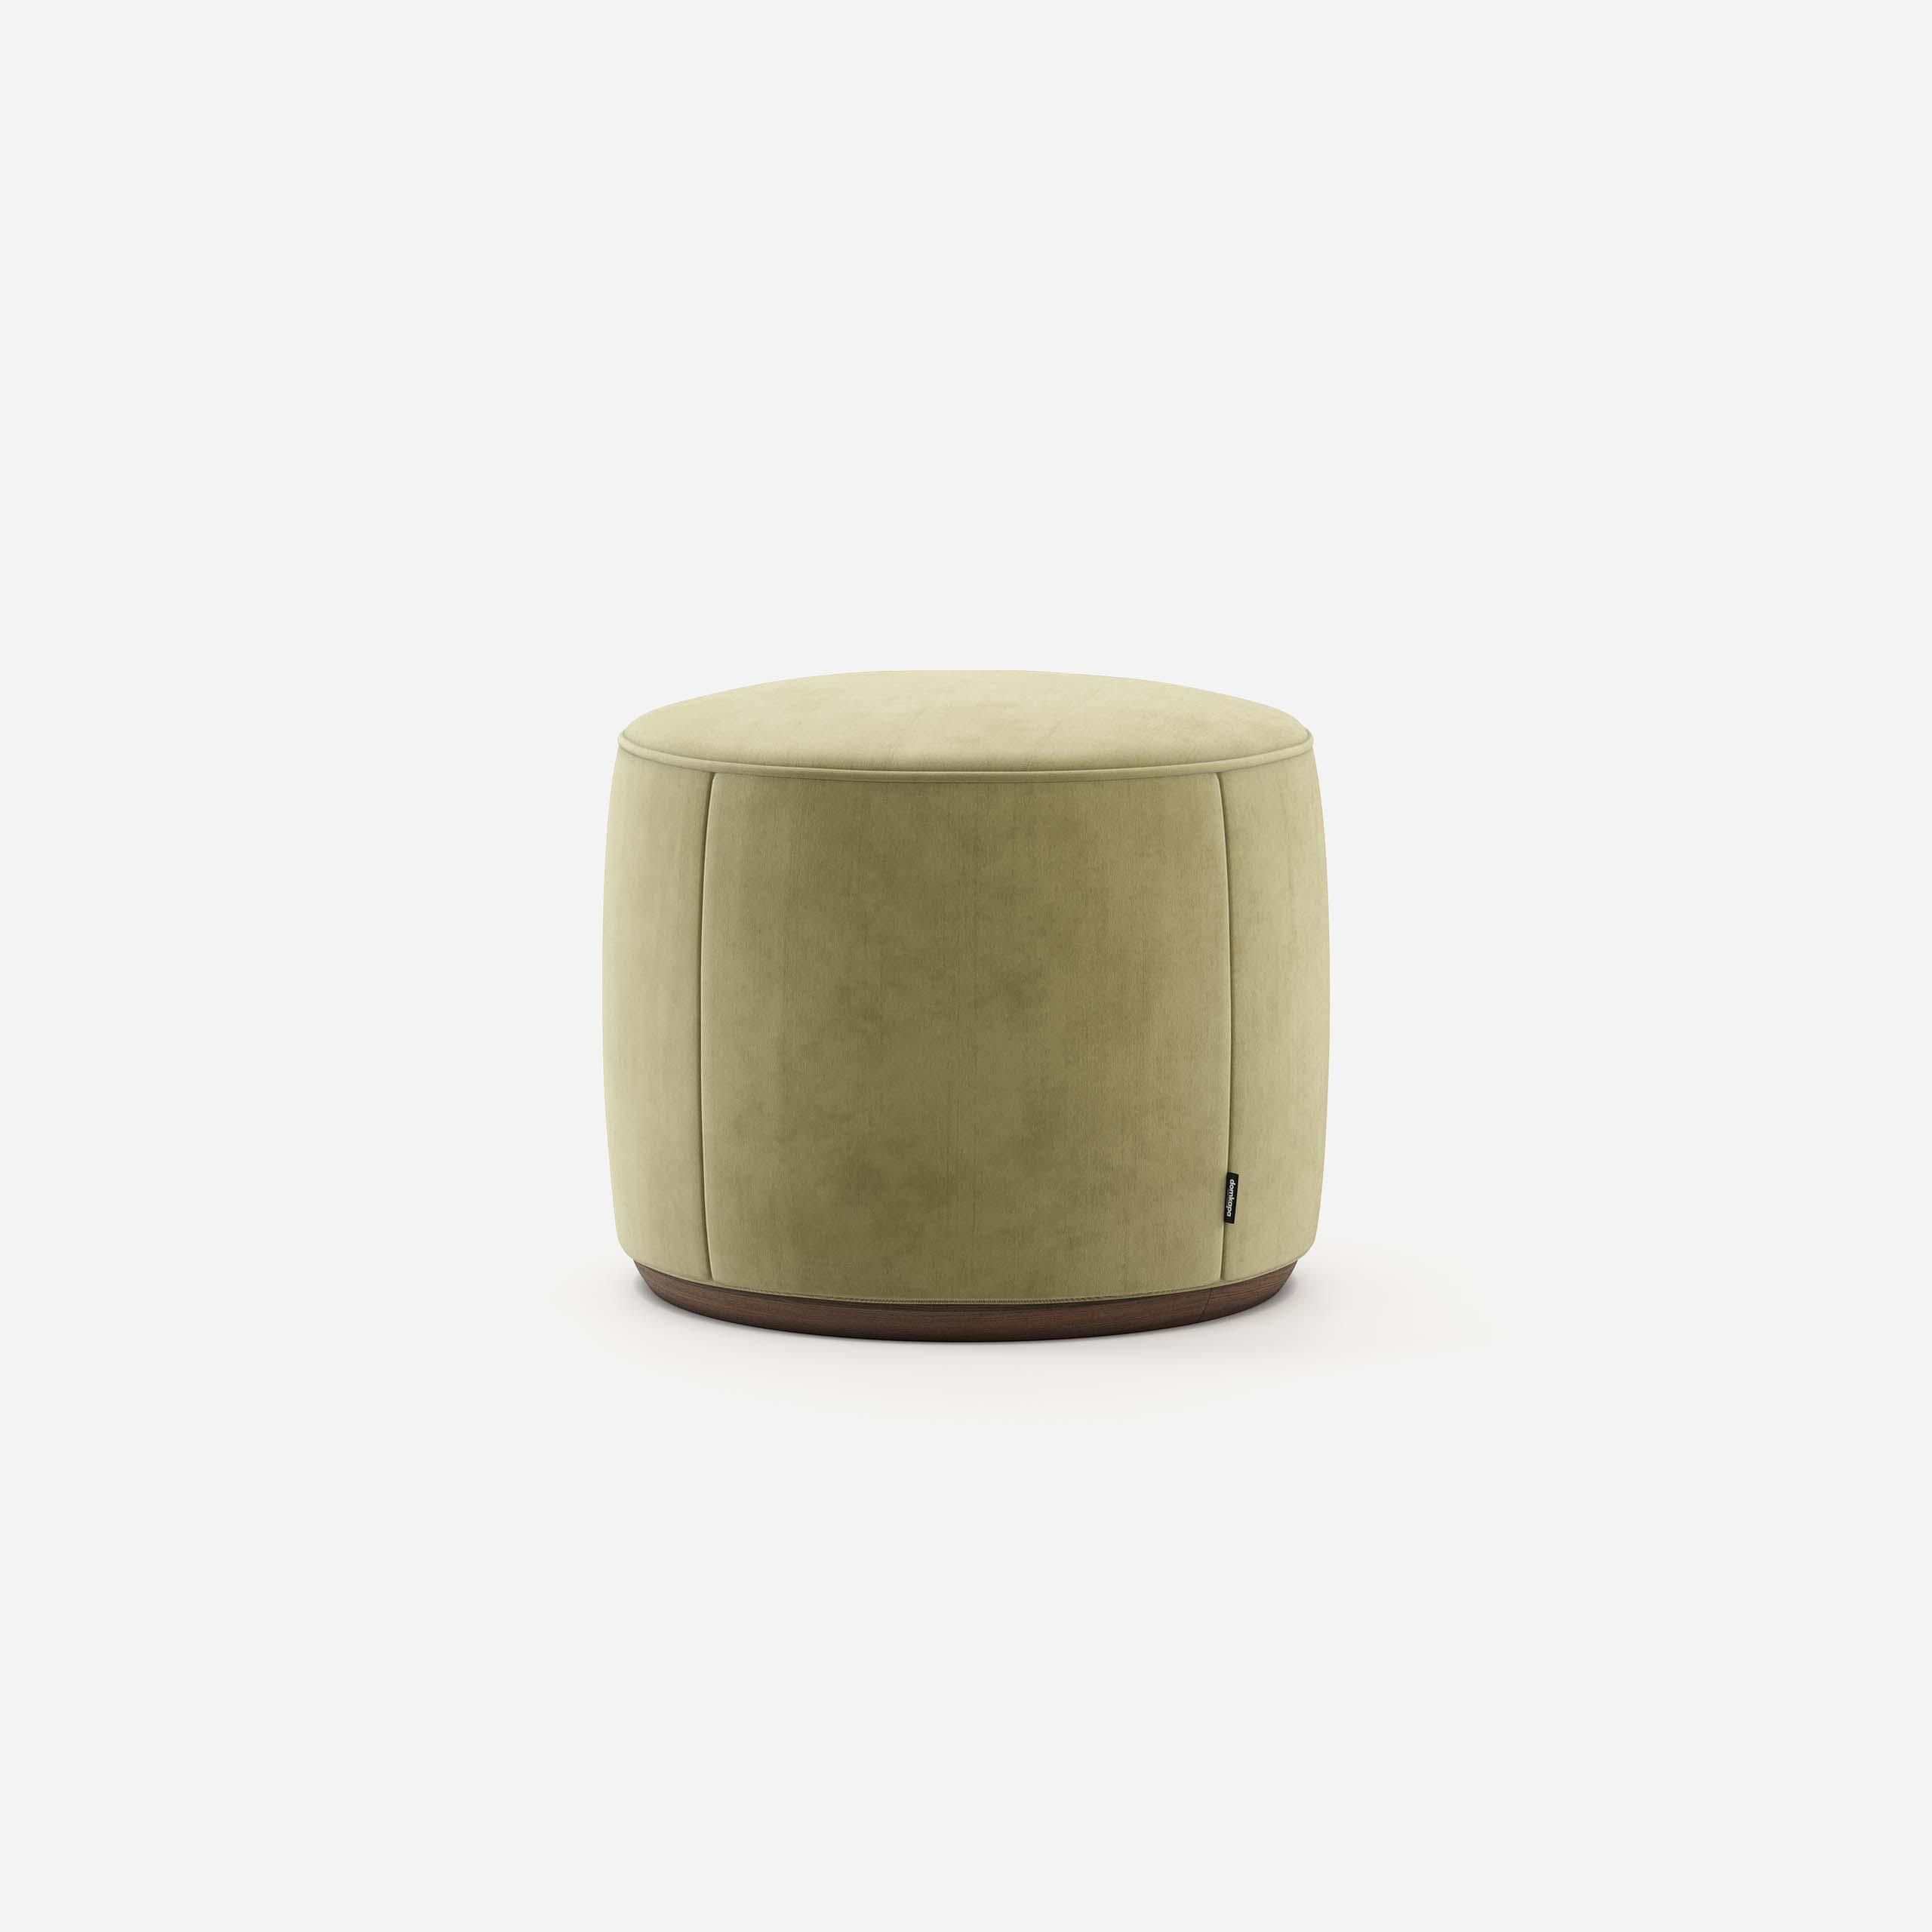 rachel-pouf-small-domkapa-new-collection-2021-home-decor